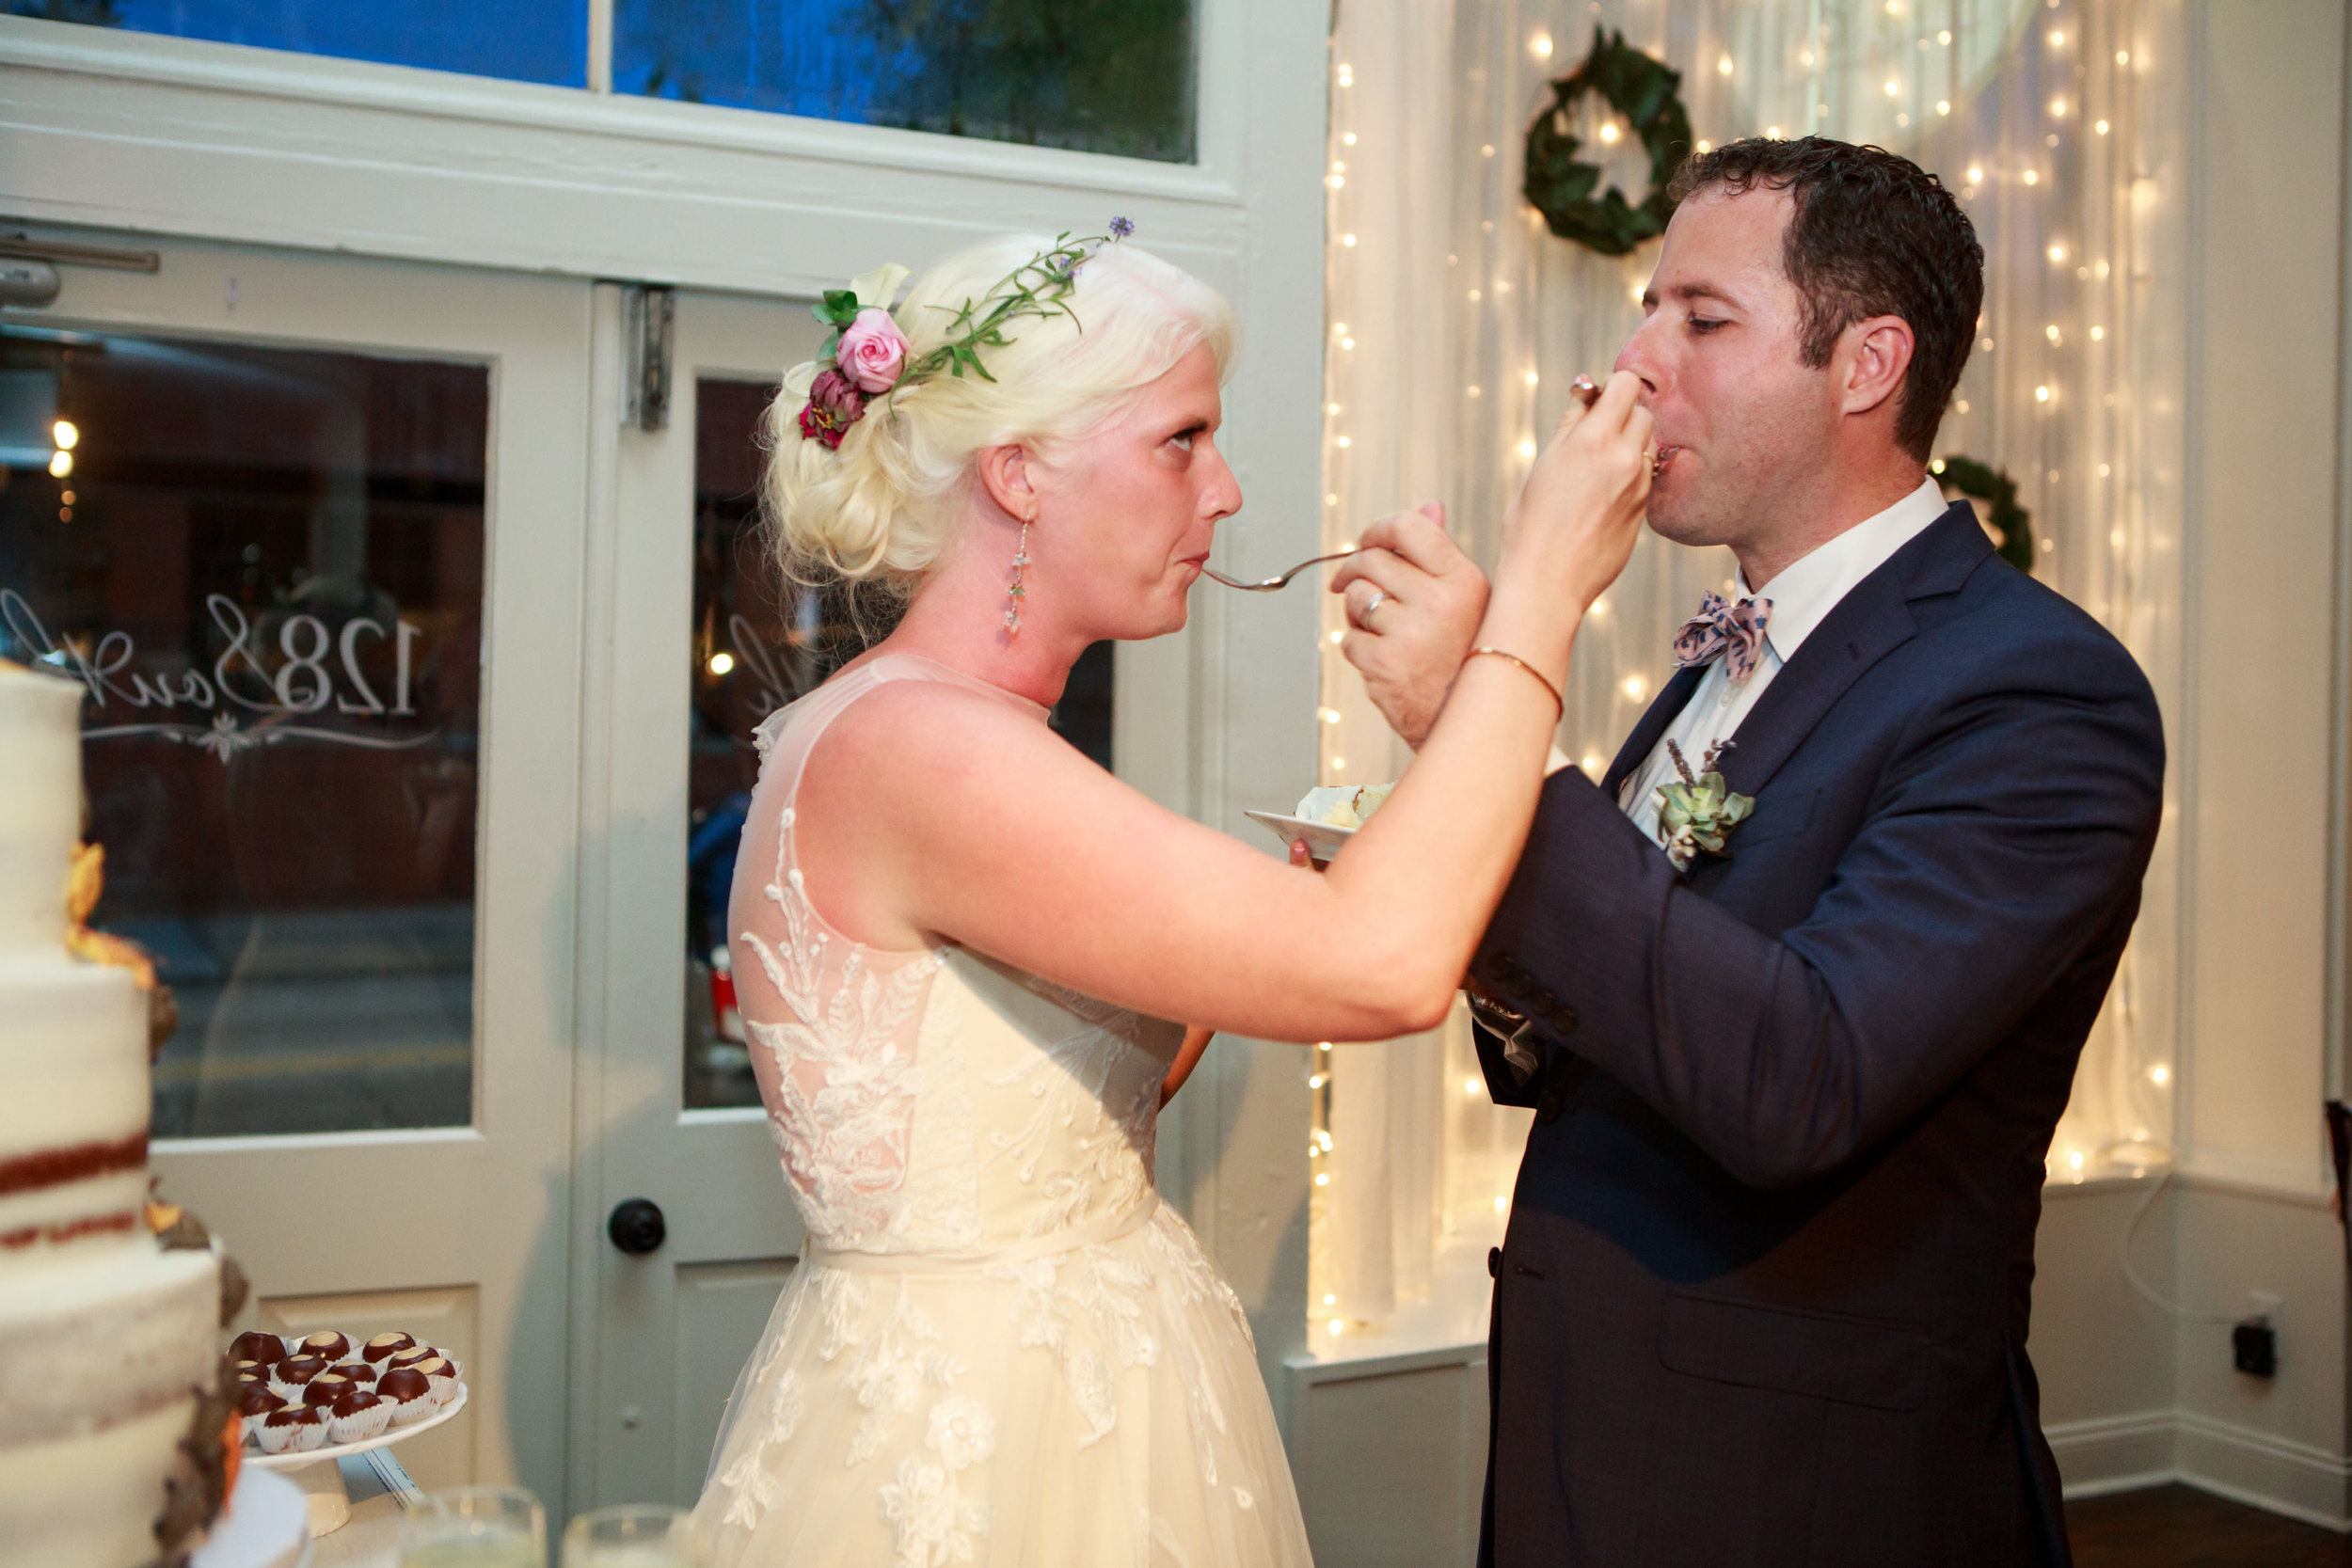 128-South-Wedding-Wilmington-NC-Photographer-Reception-87.jpg